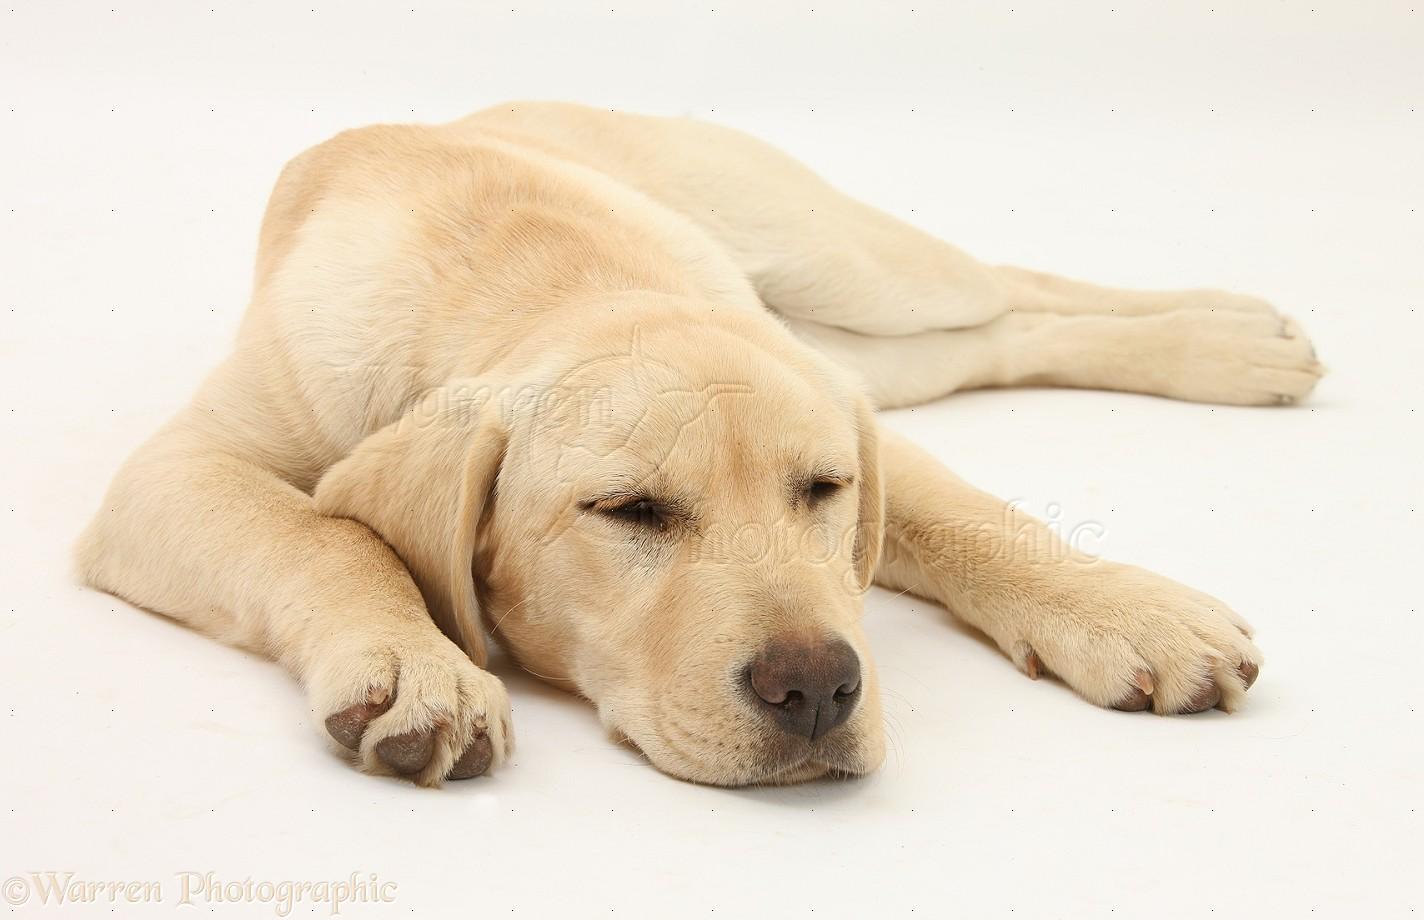 Dog Sleepy Yellow Labrador Pup 5 Months Old Photo Wp33164